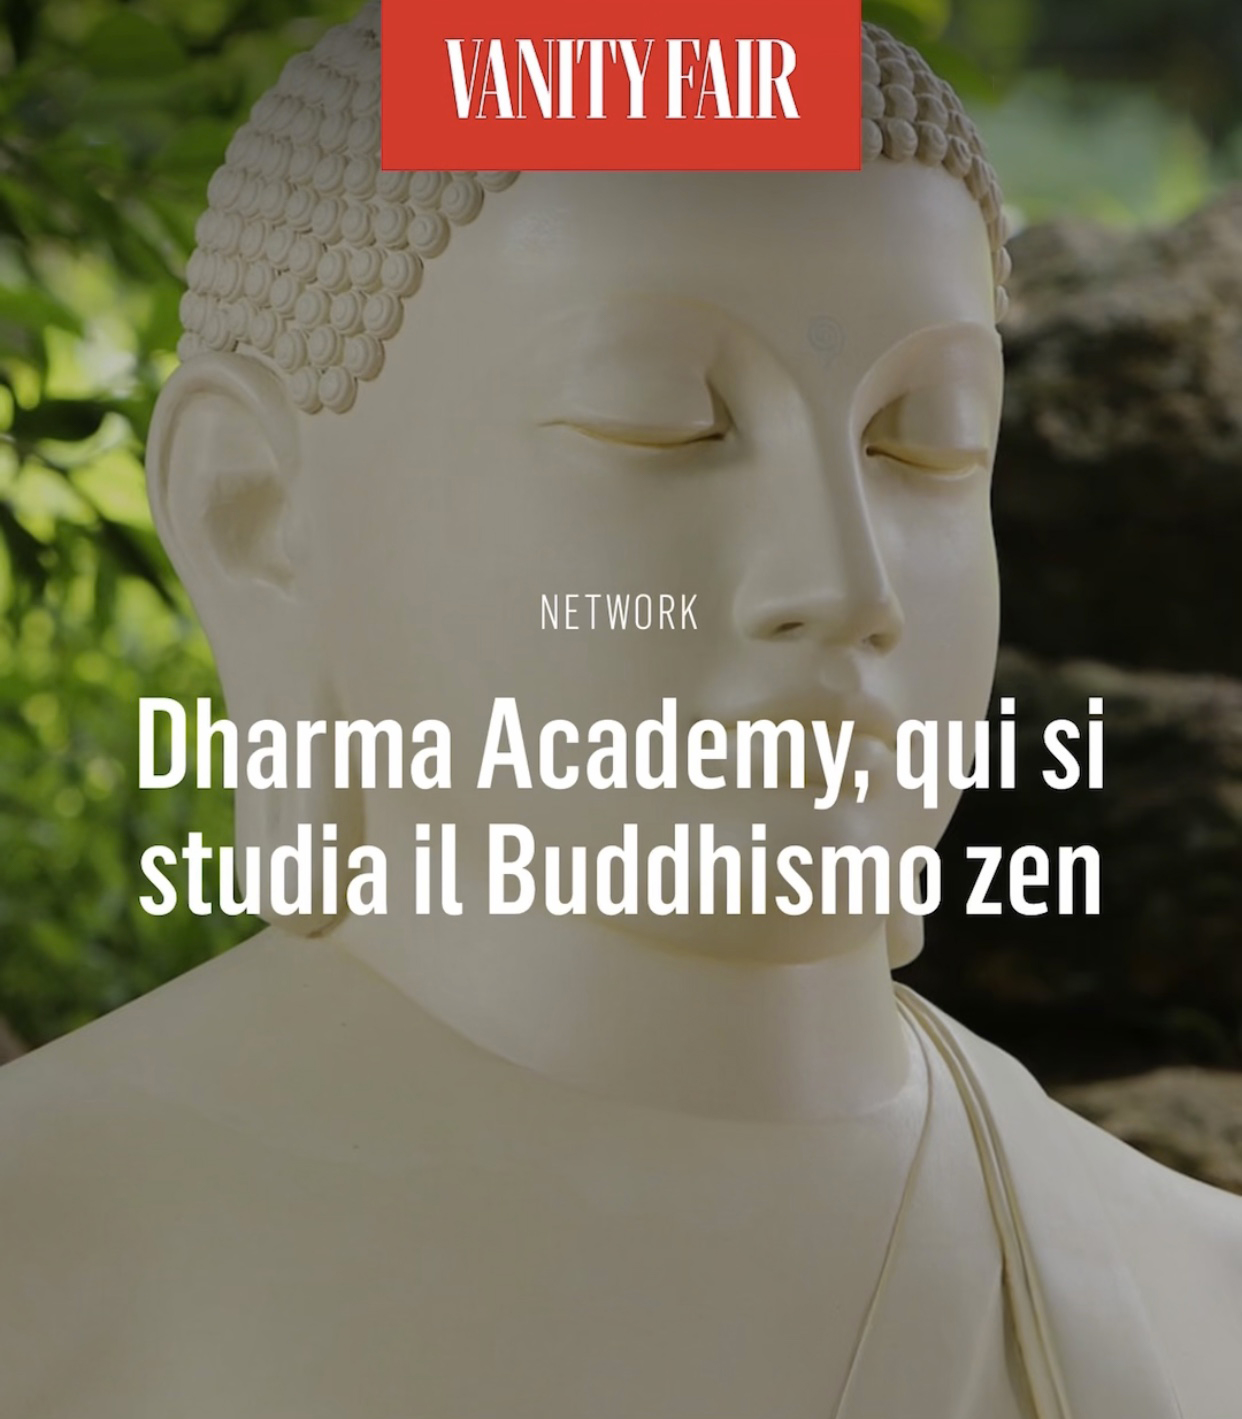 Vanity Fair su Dharma Academy